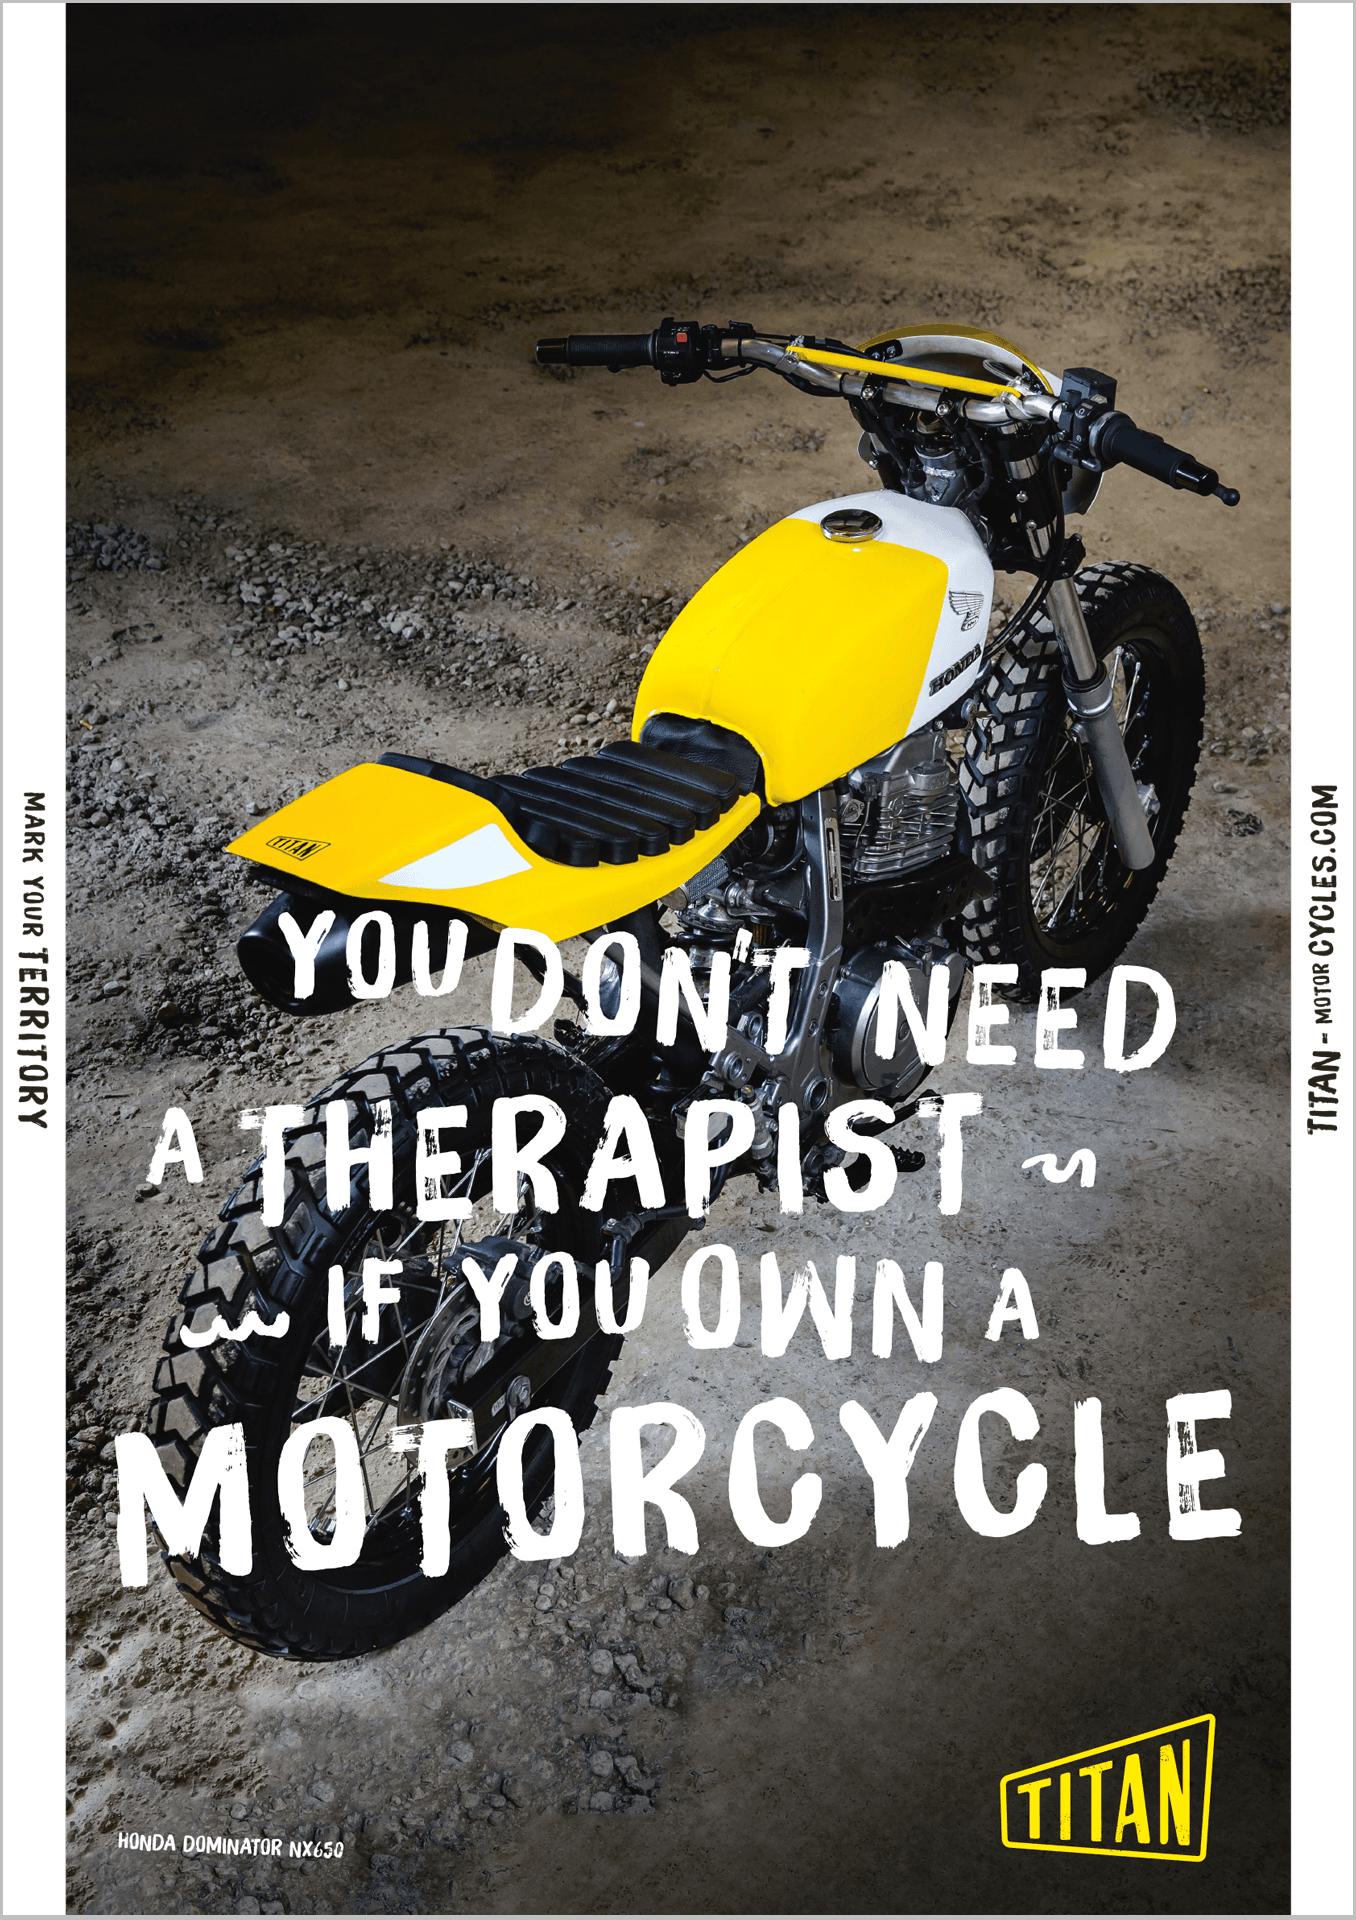 Titan Motorcycles Poster 1